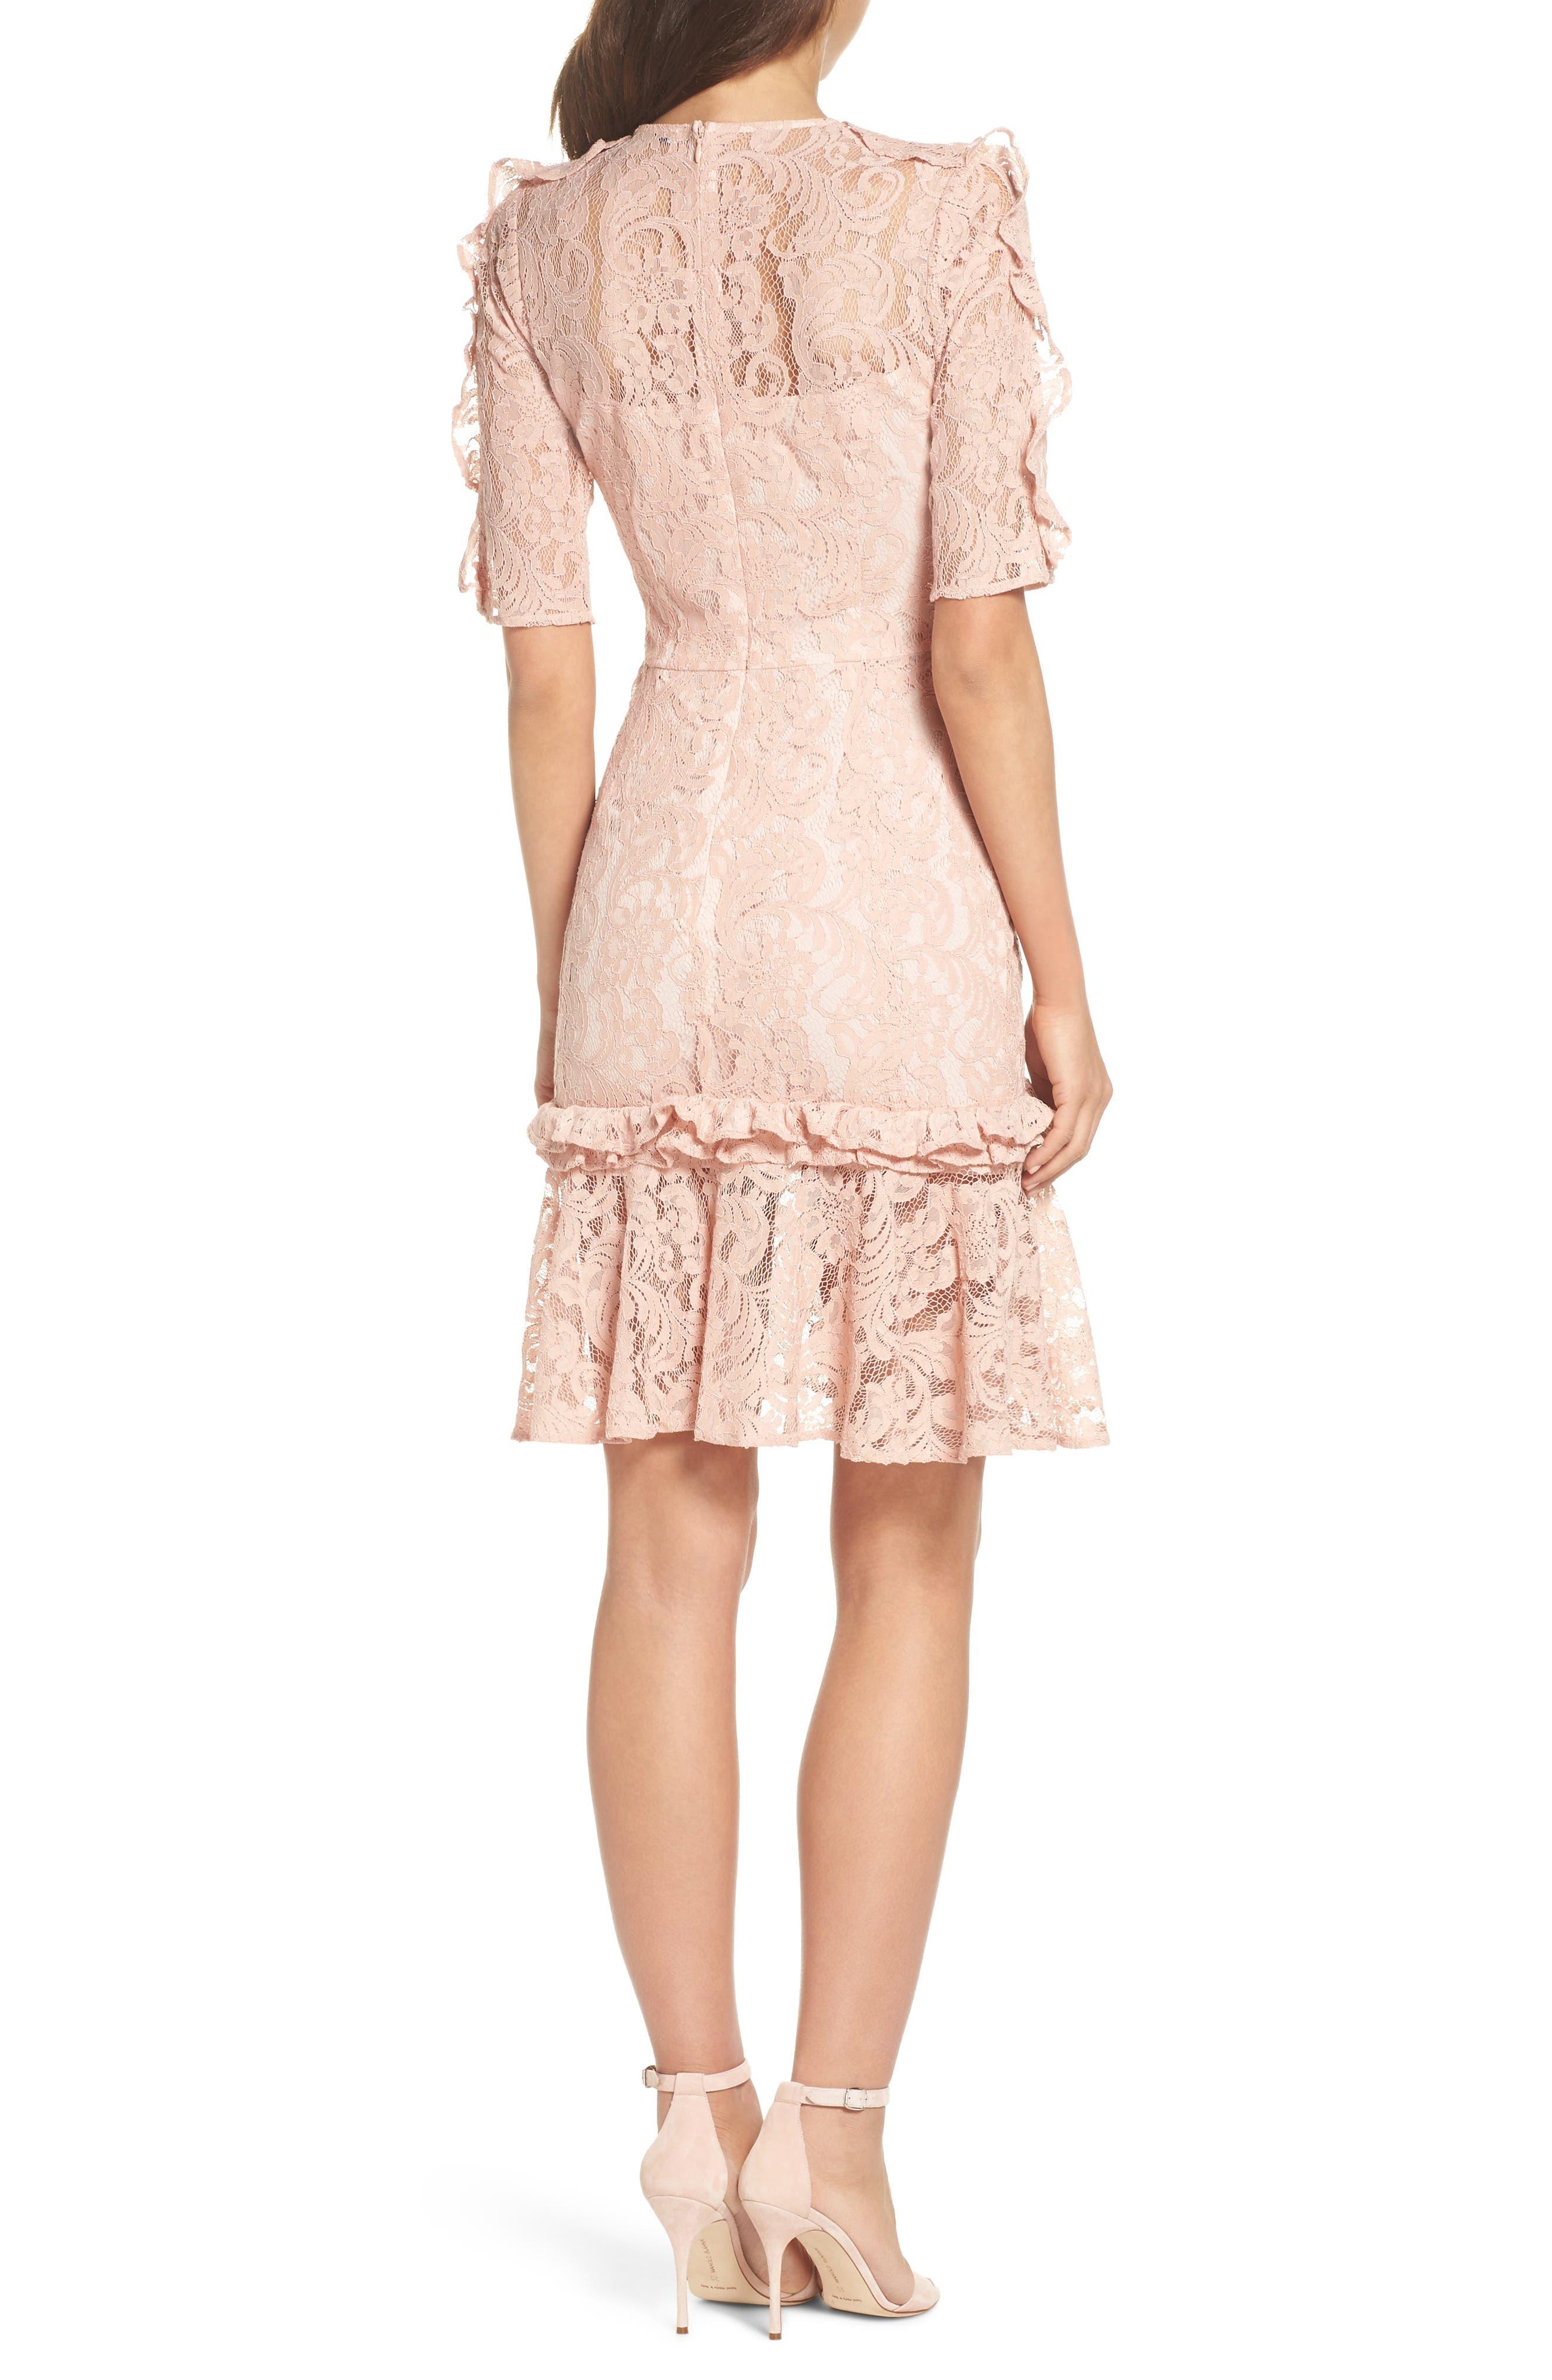 Hushed Dove Lace Dress,                             Alternate thumbnail 2, color,                             Rose Cloud